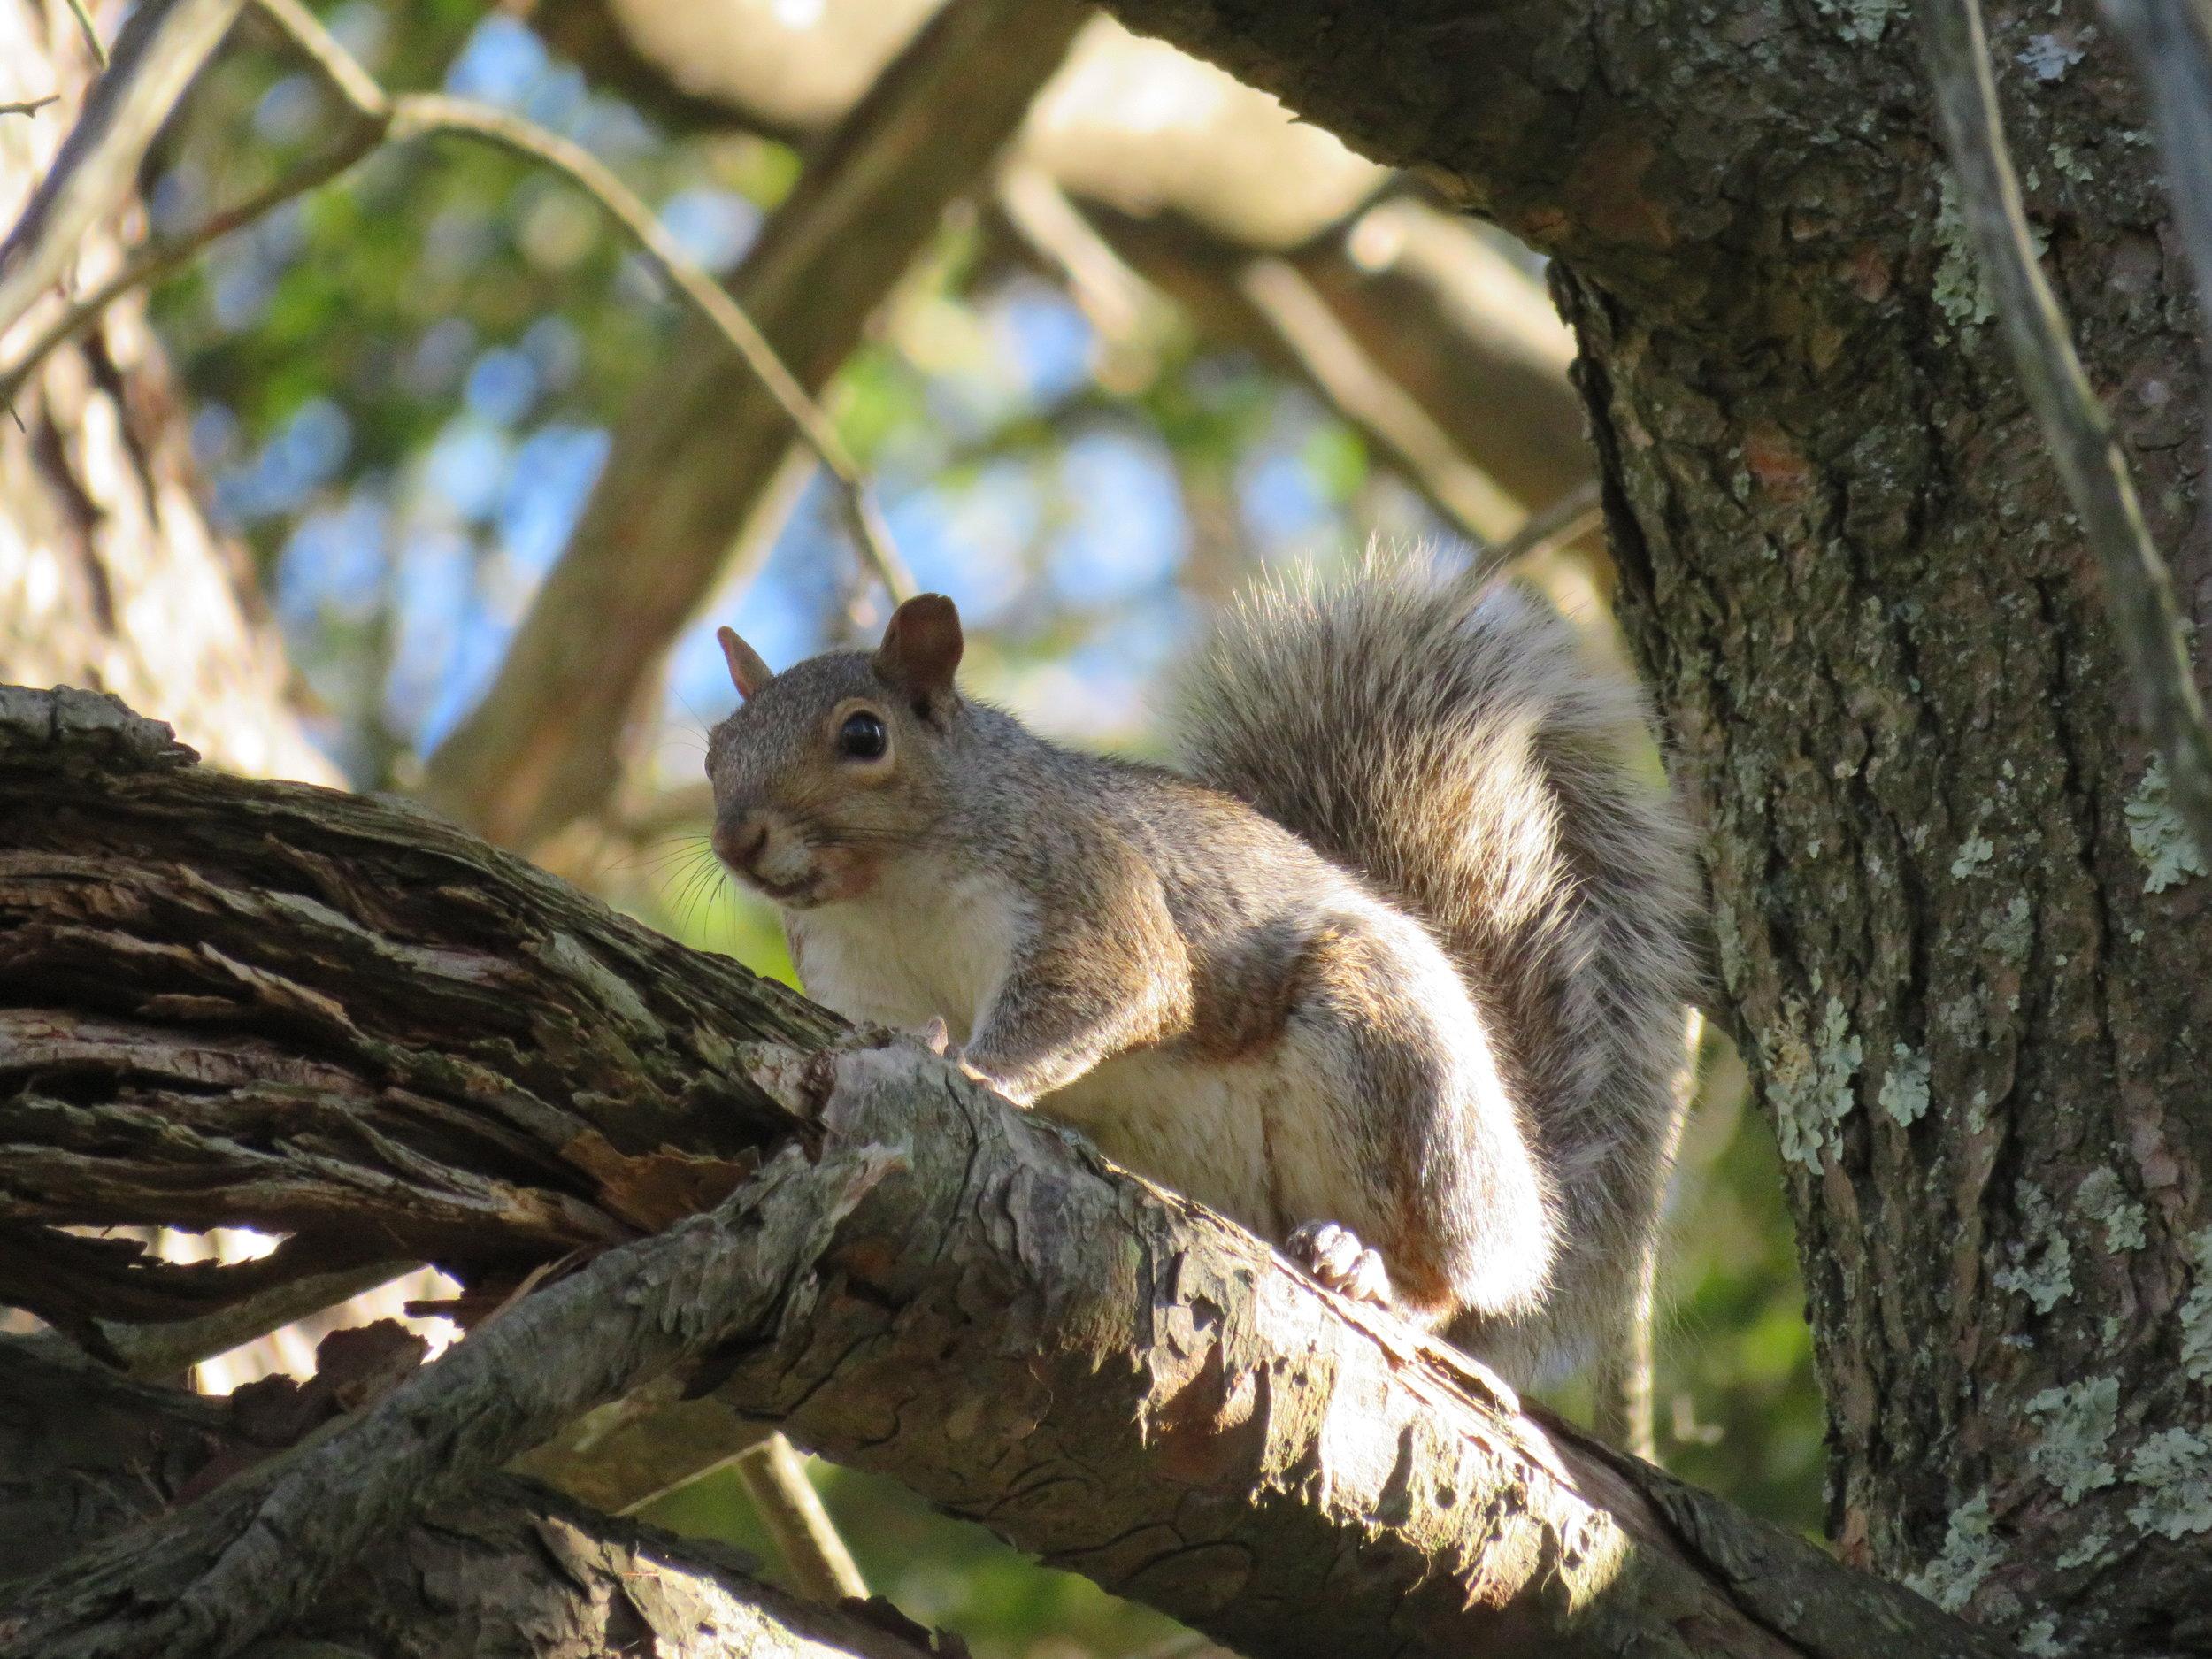 alone_squirrel up tree.JPG